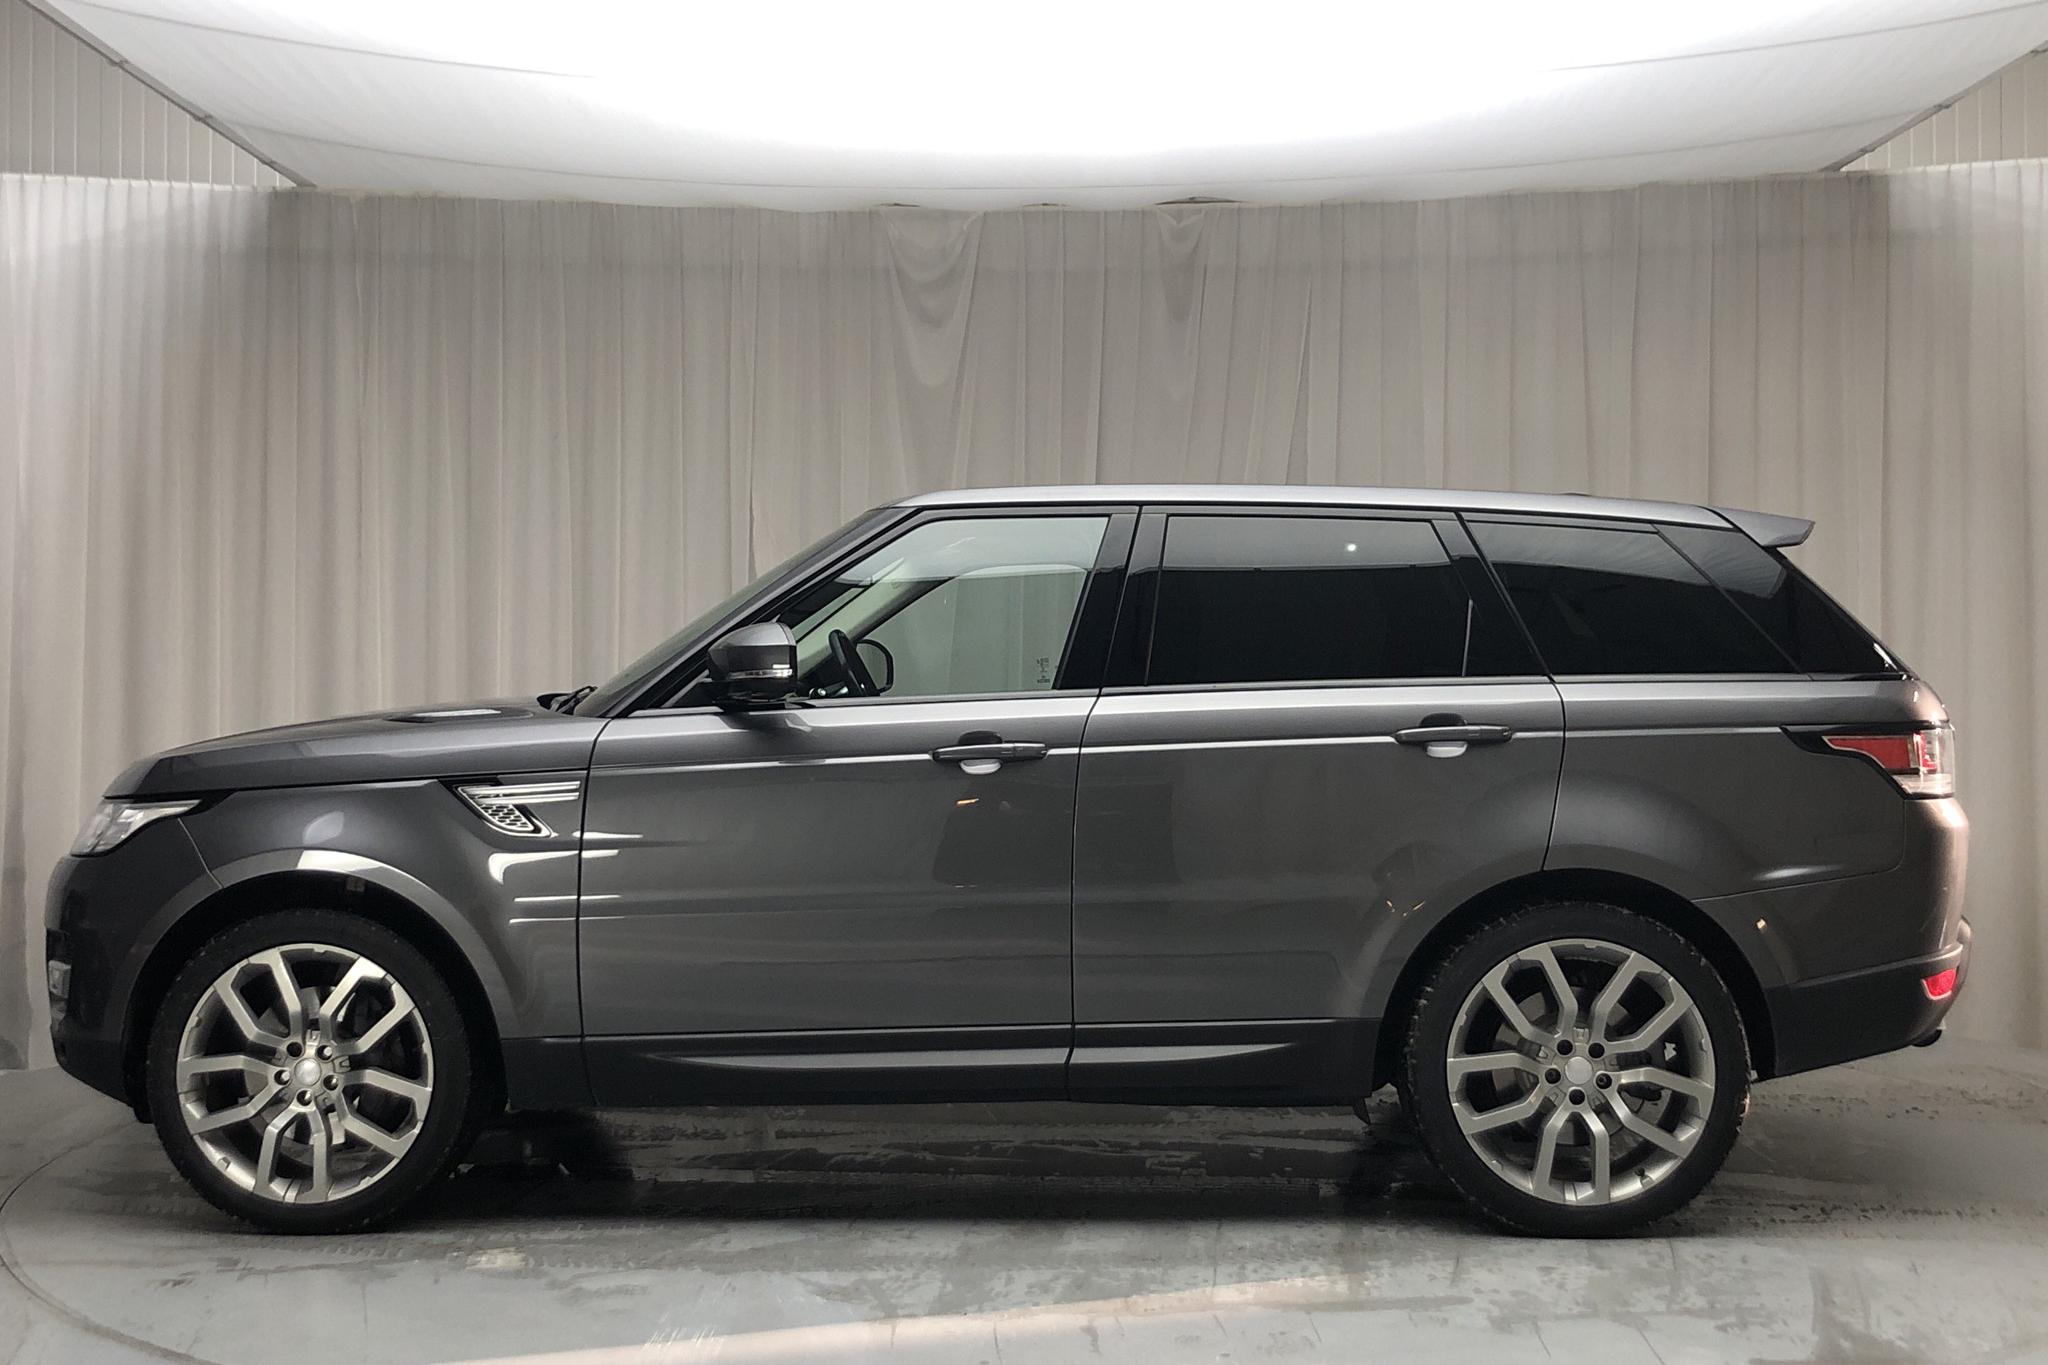 Land Rover Range Rover Sport 3.0 SDV6 (292hk) - 15 672 mil - Automat - grå - 2014